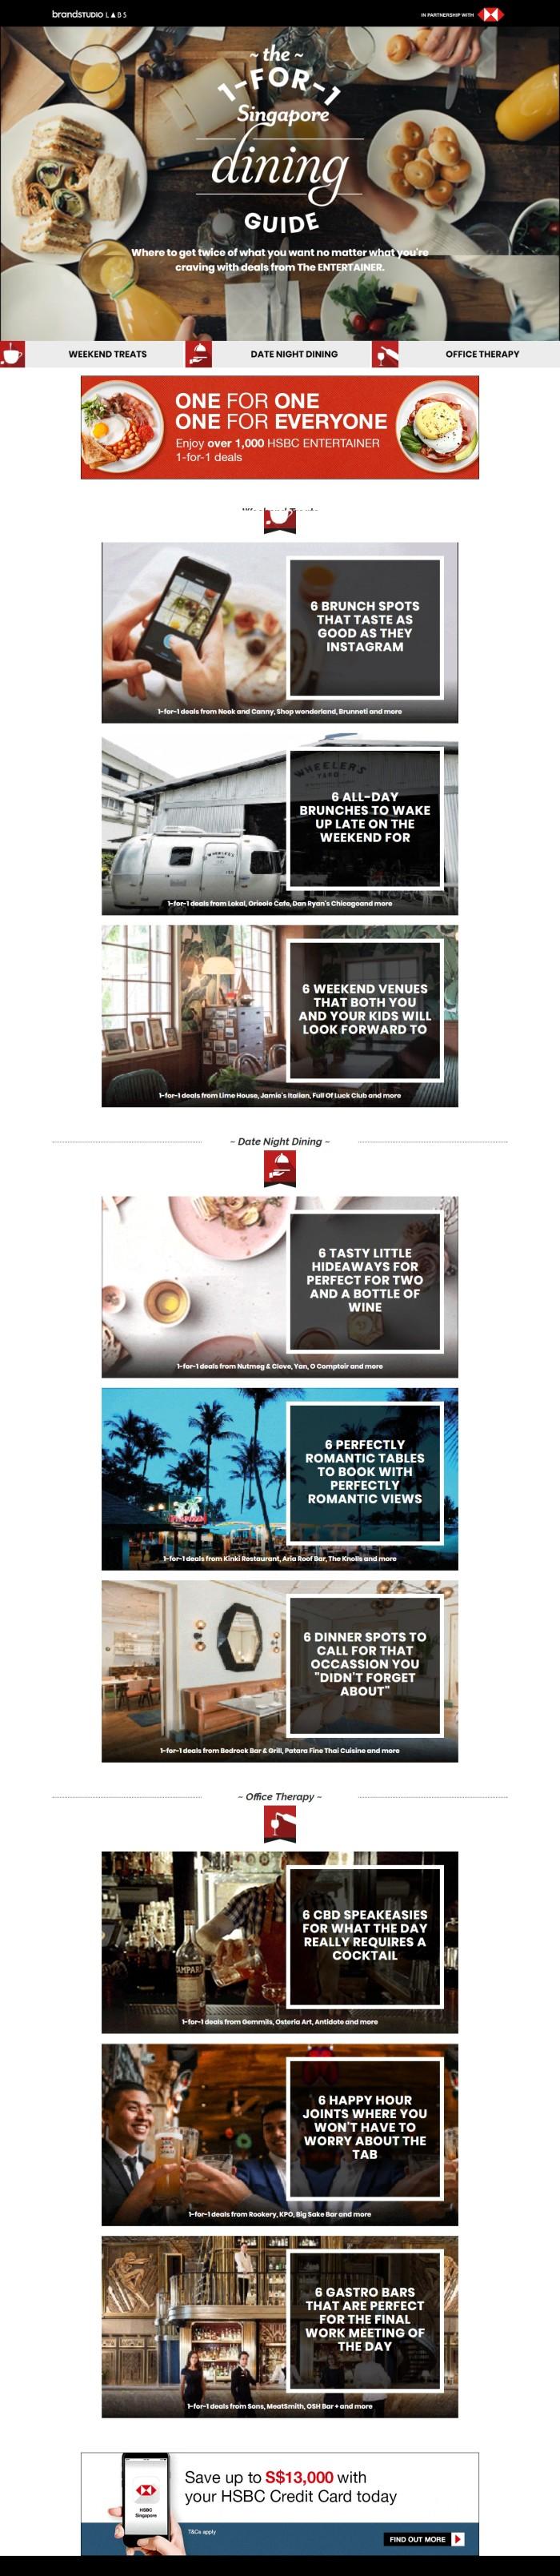 HSBC_landing page